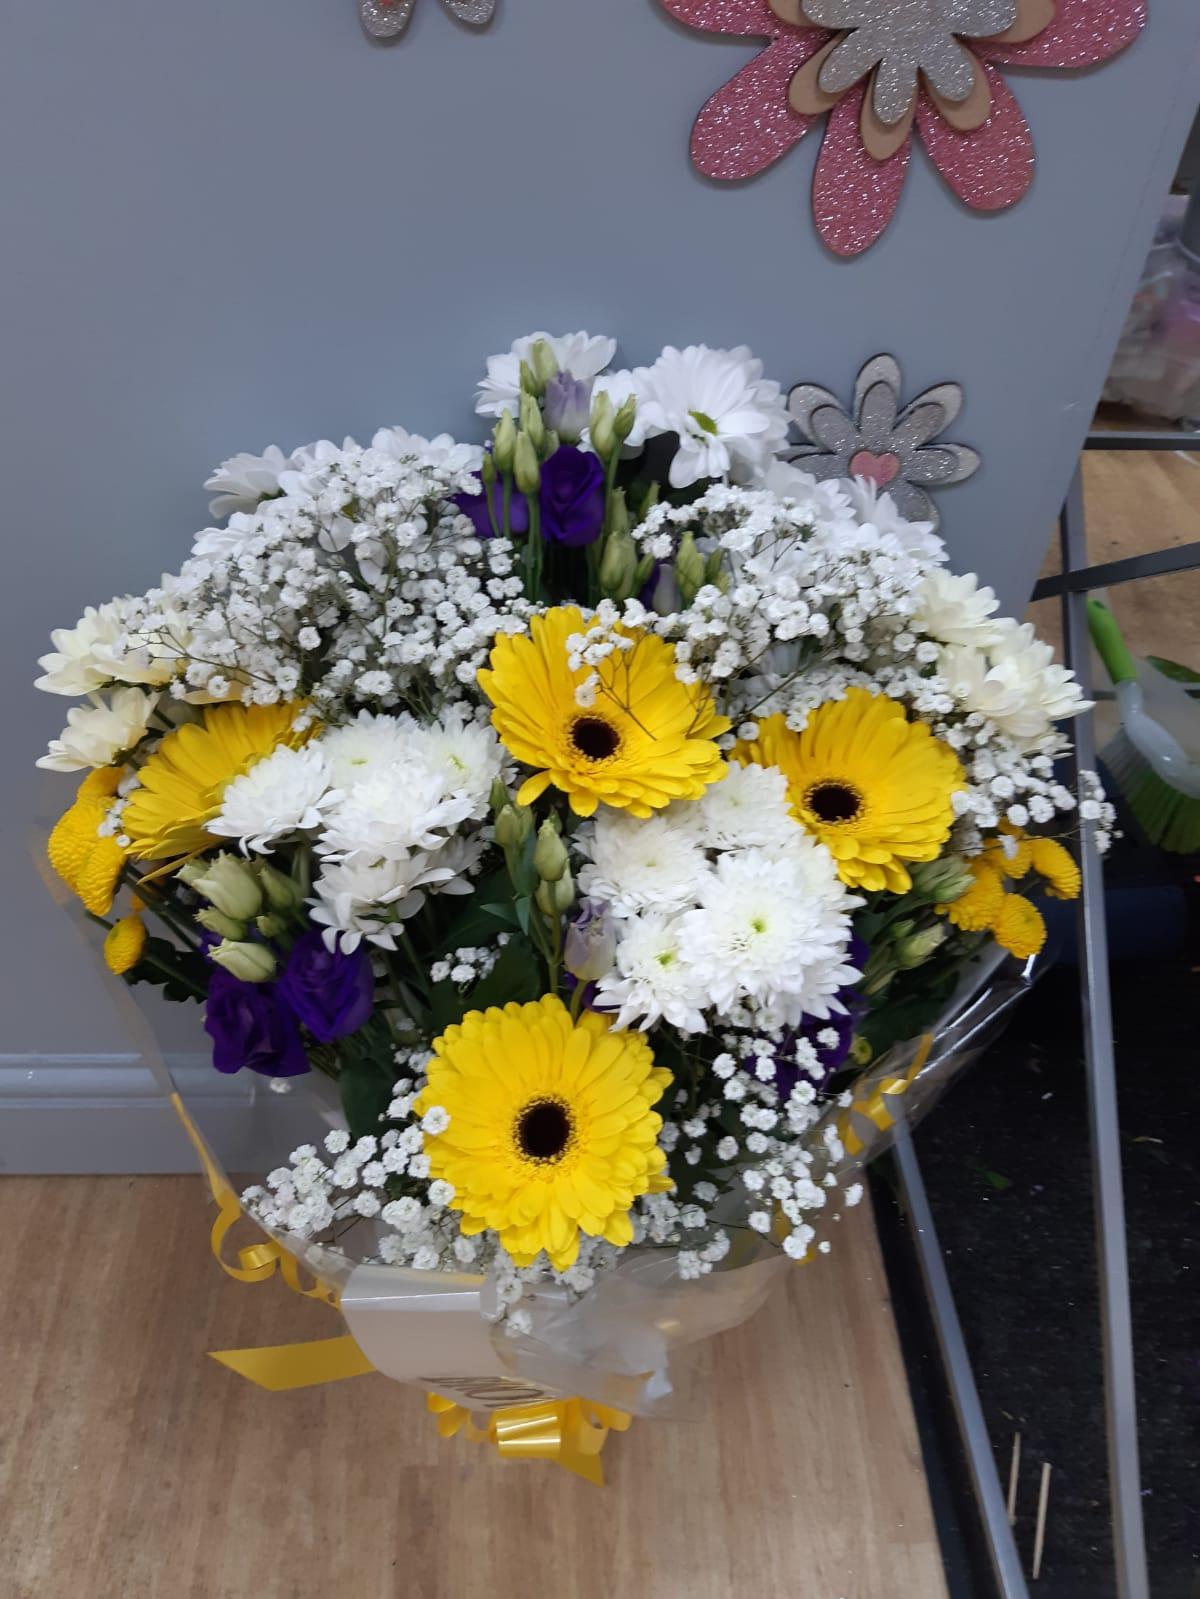 Funeral flat bouquet eustoma gyp Chrysant germini